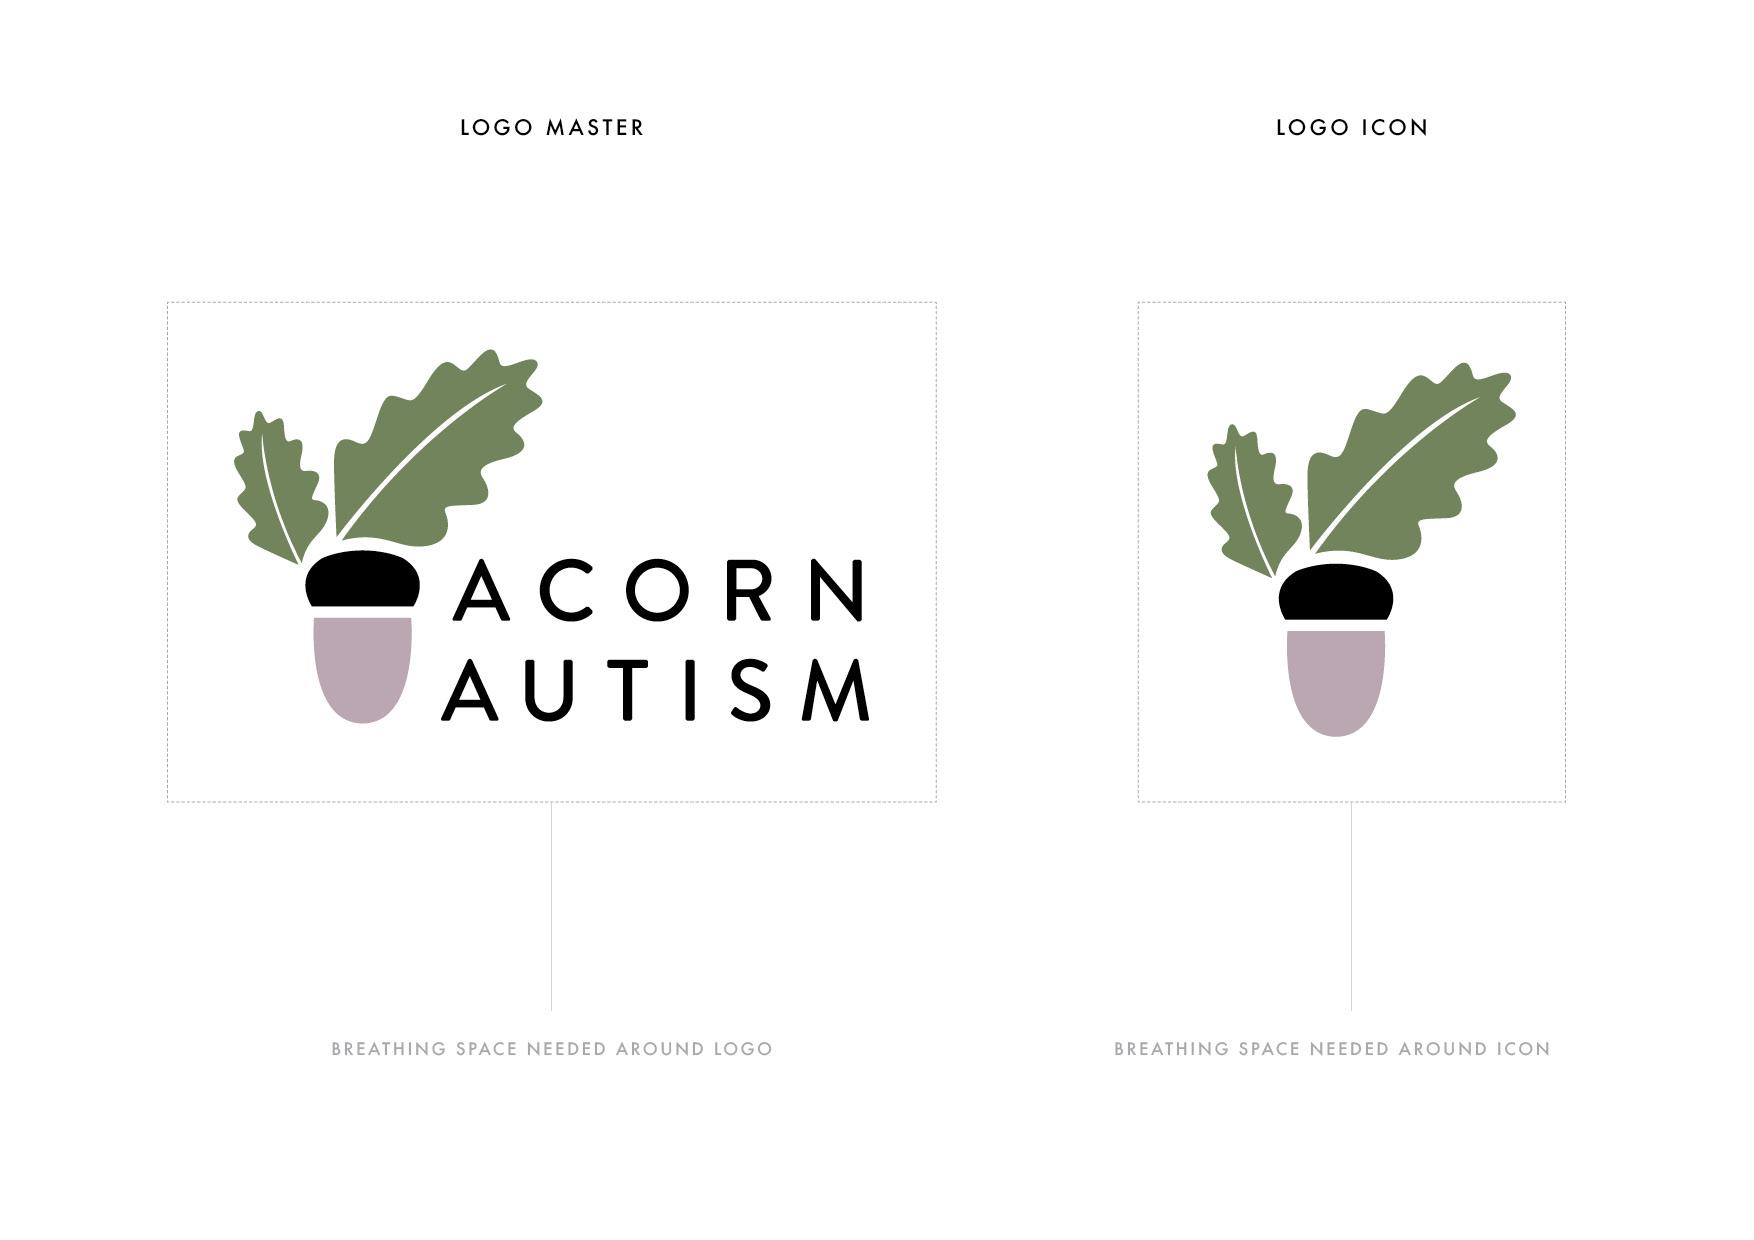 Rochelle-Vranjes-Acorn-Autism-Branding-Guidelines3.jpg